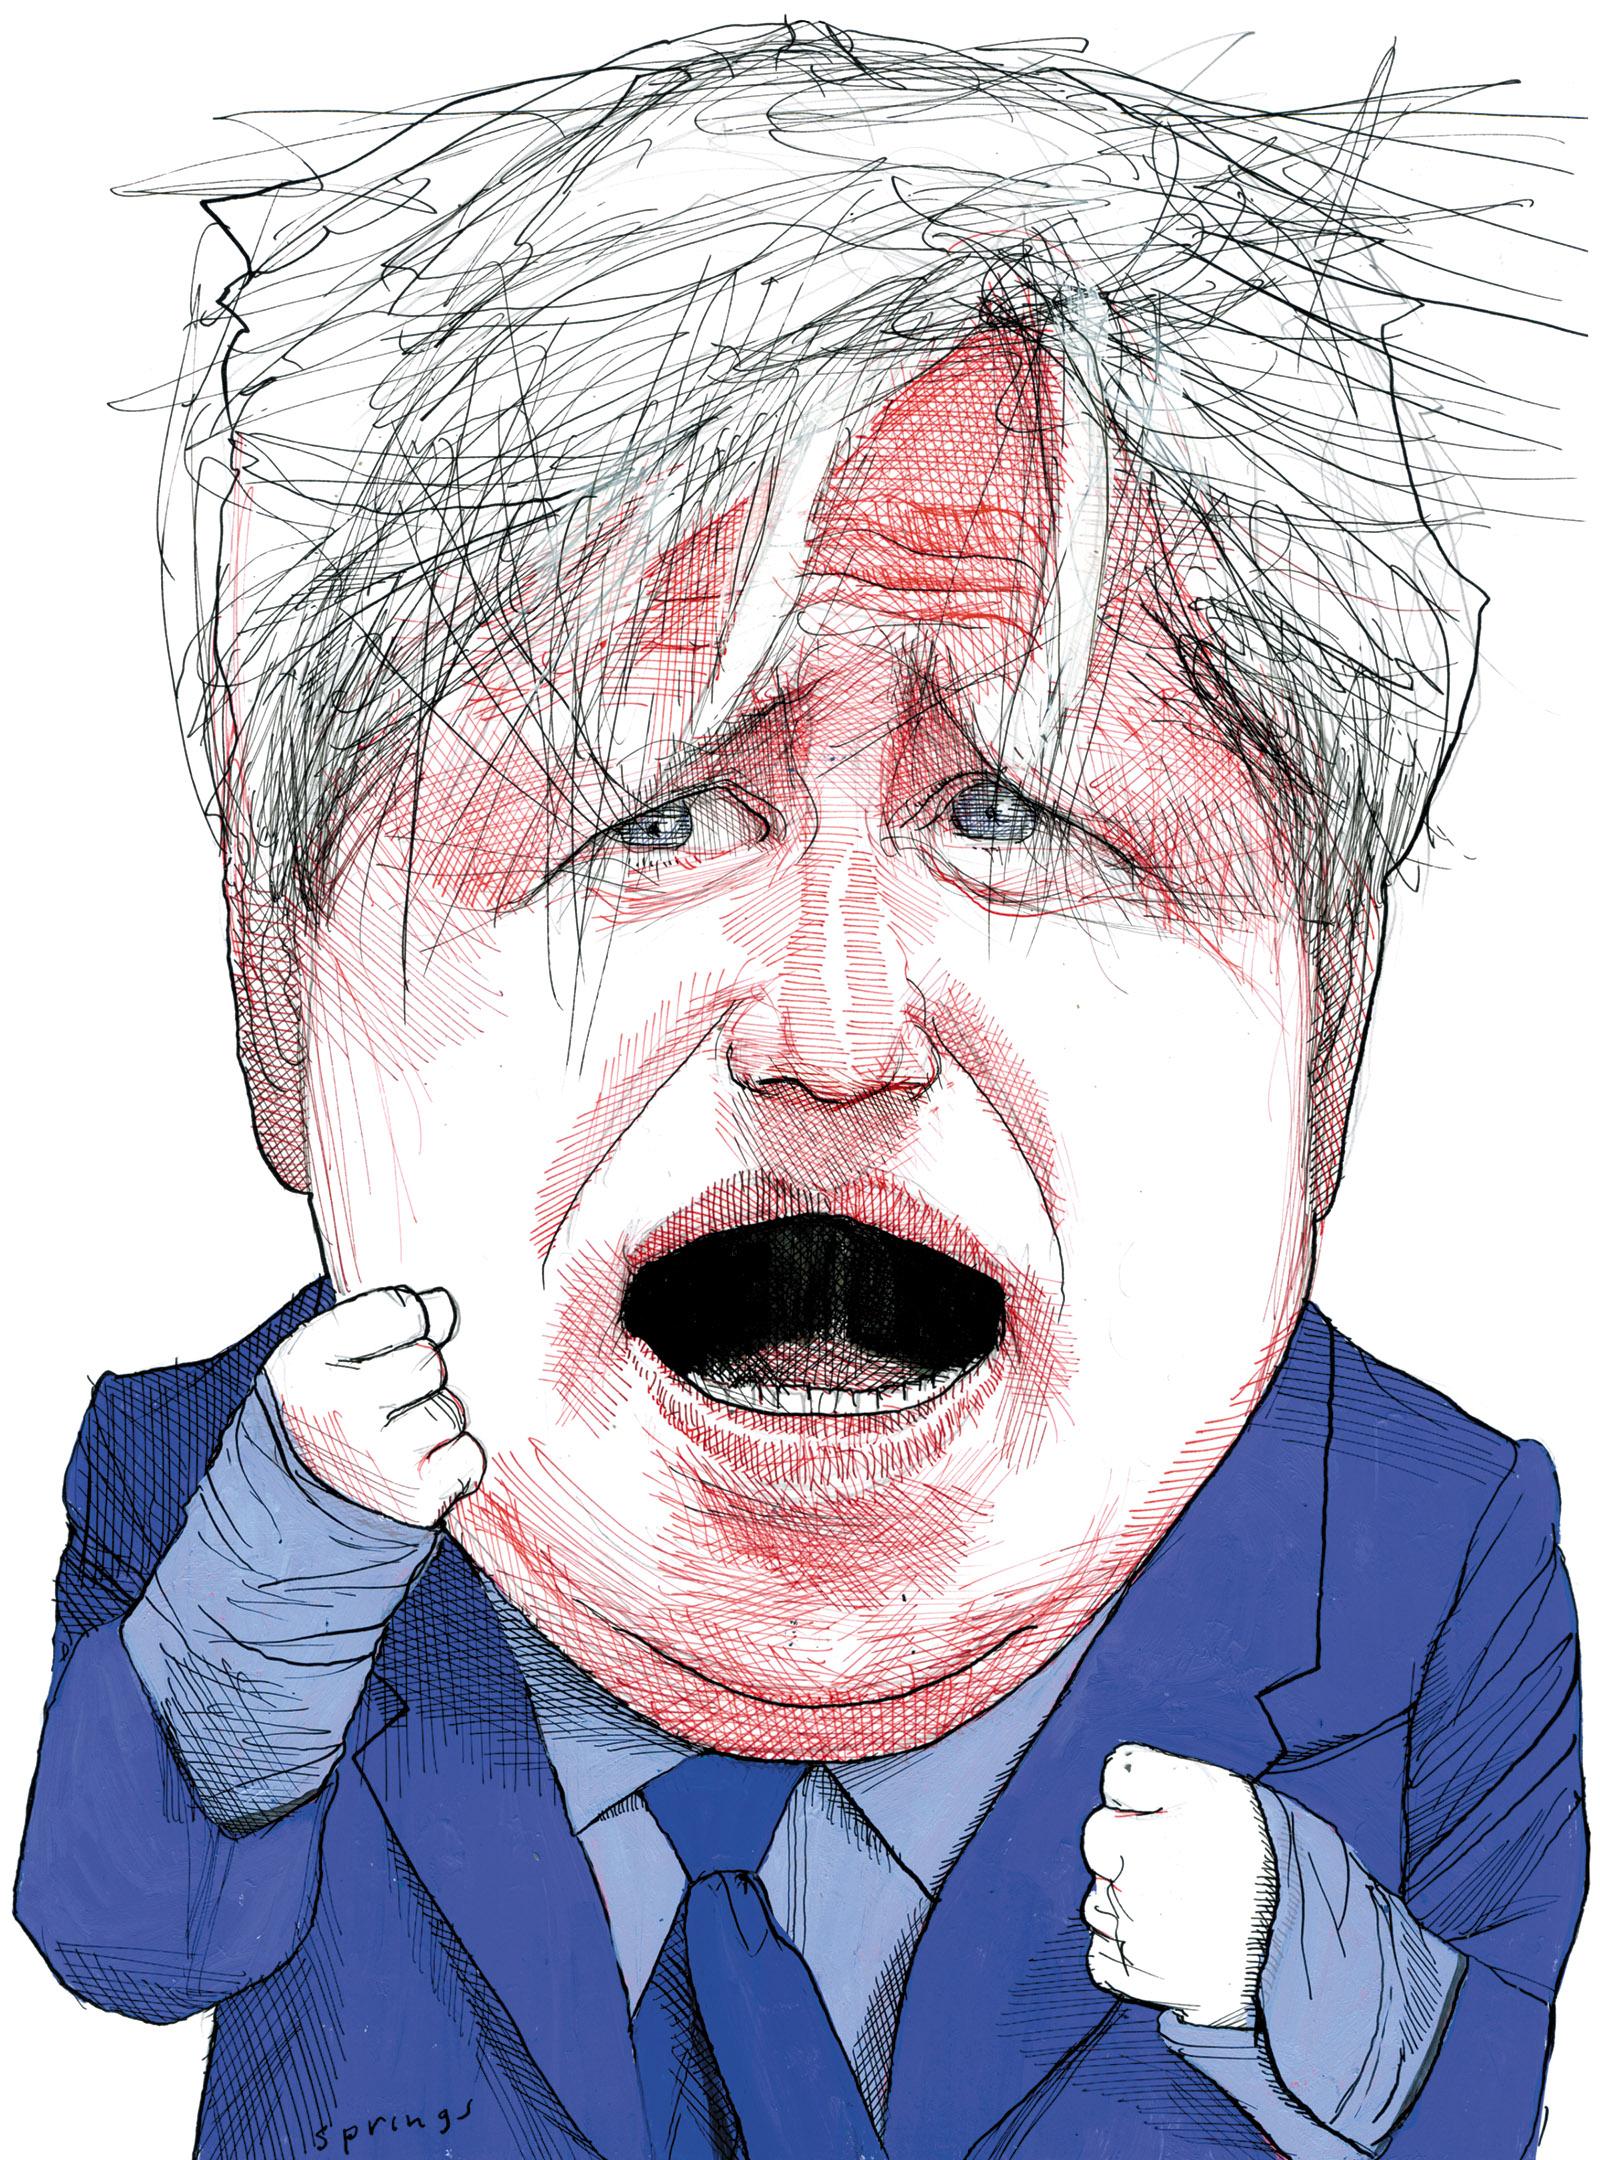 Boris Johnson, drawing by John Springs